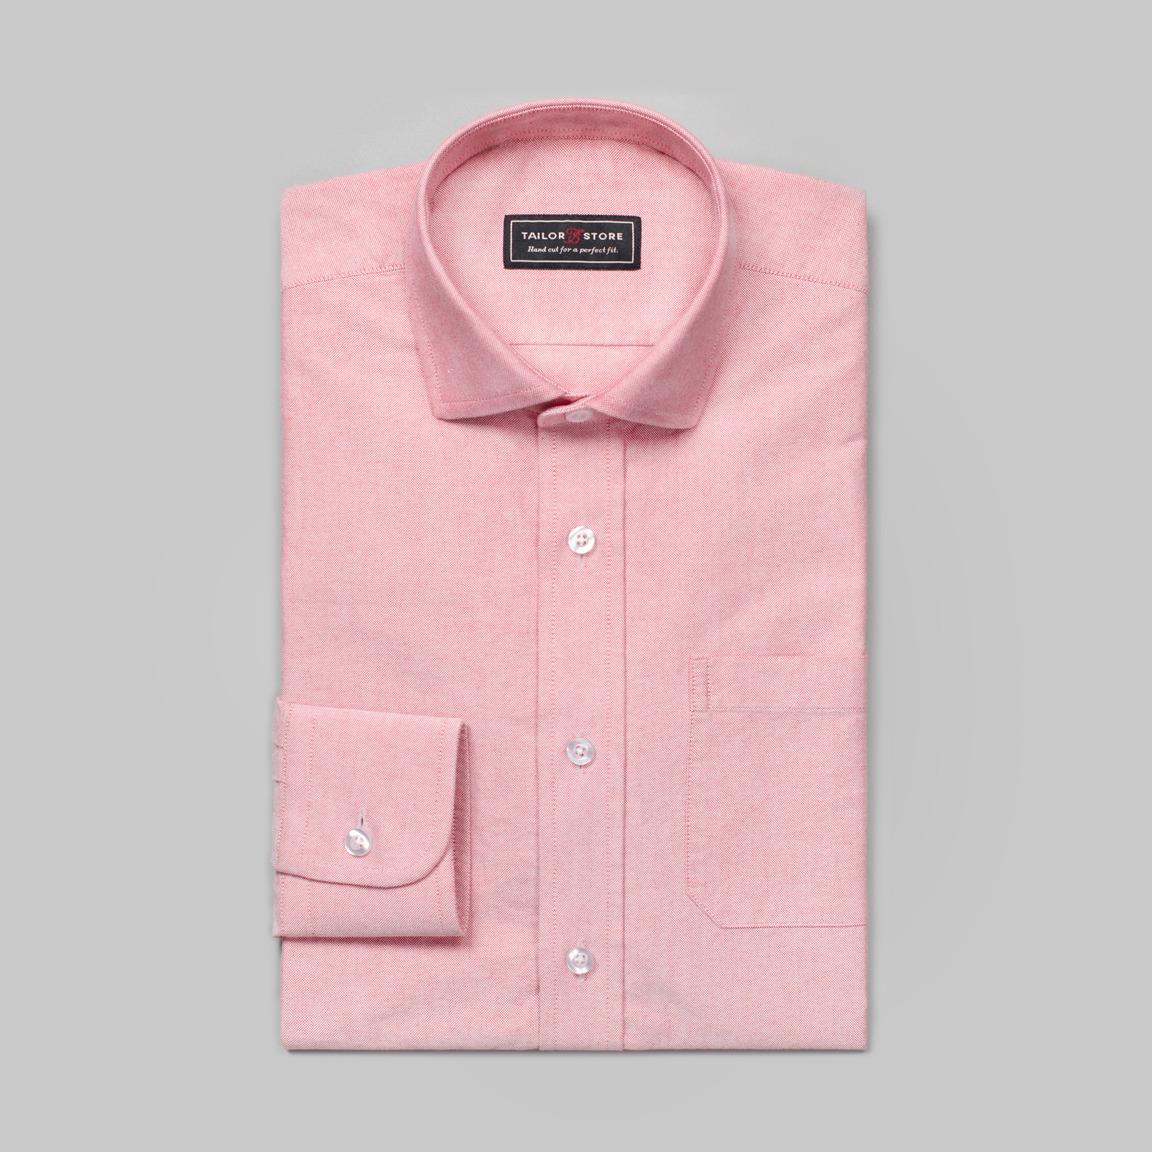 Hellrotes Oxford-Hemd